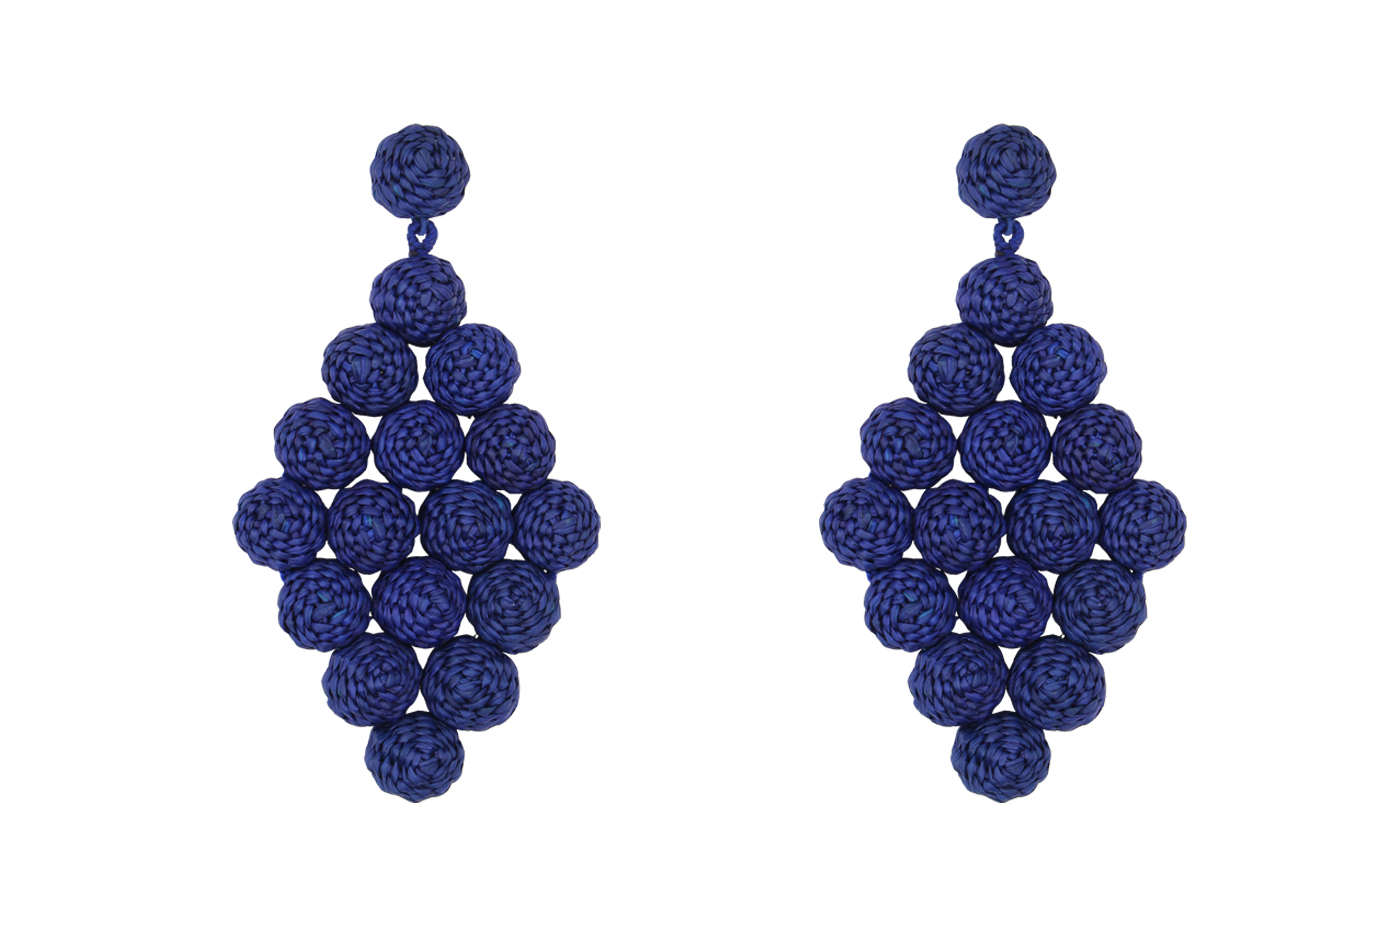 Aretes Rombo # 2-azul rey